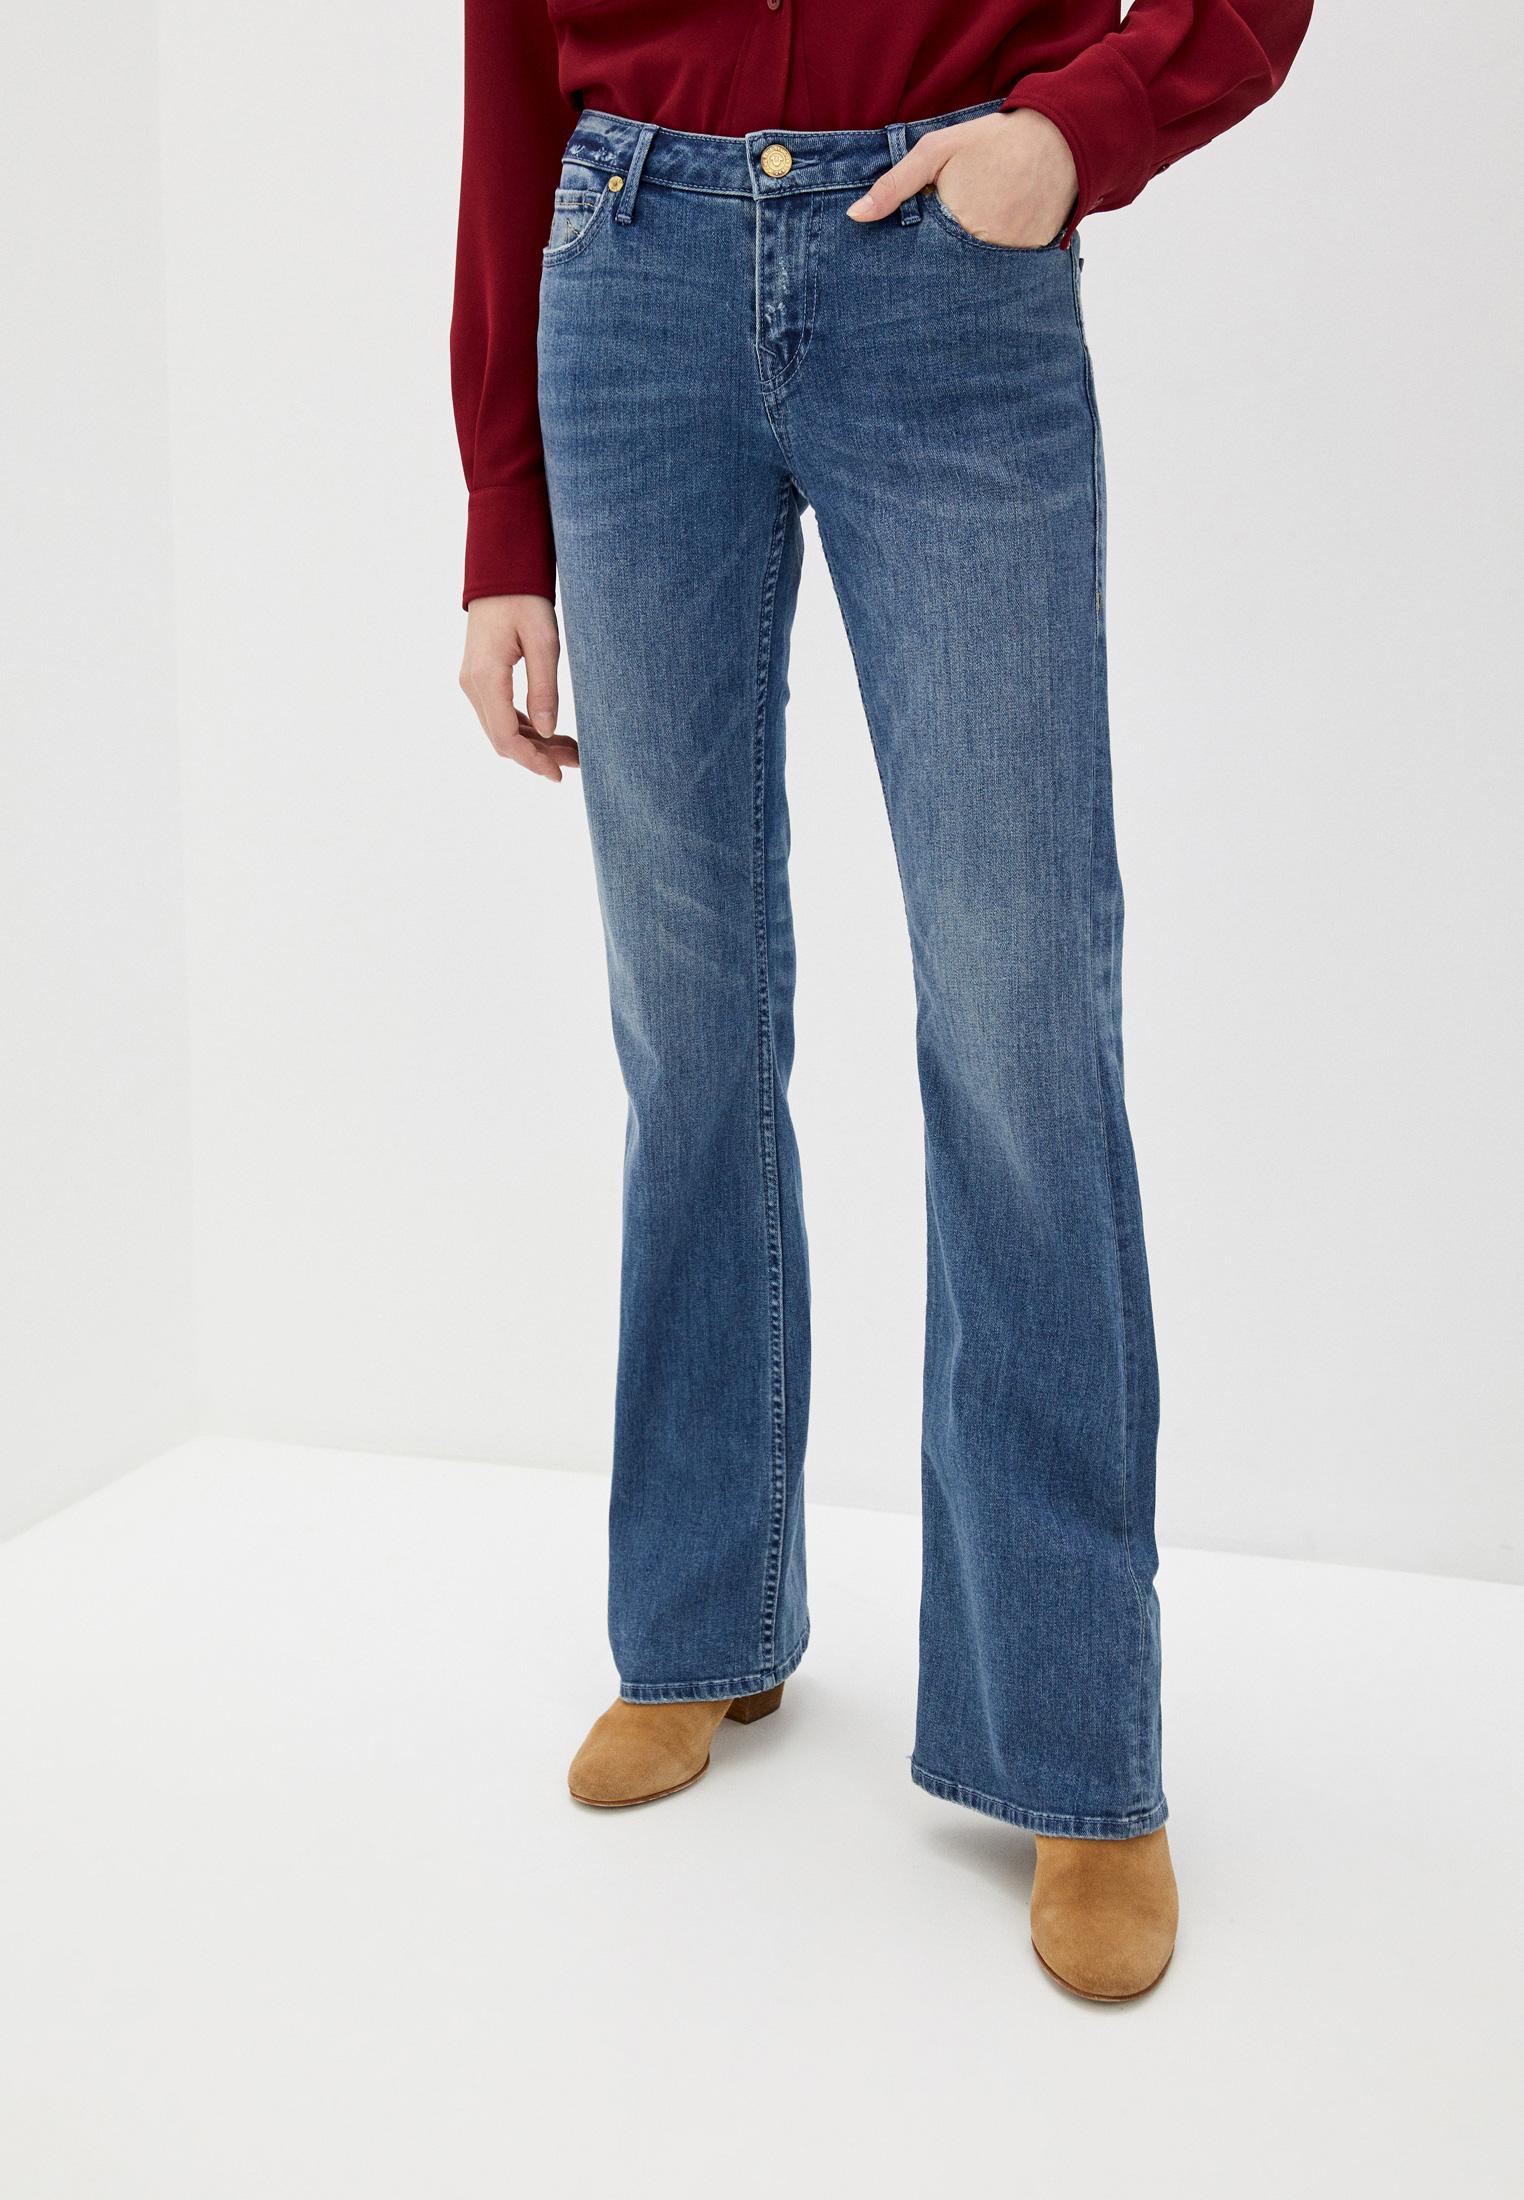 Regatta Pantaloni Da Uomo Lana Torretta